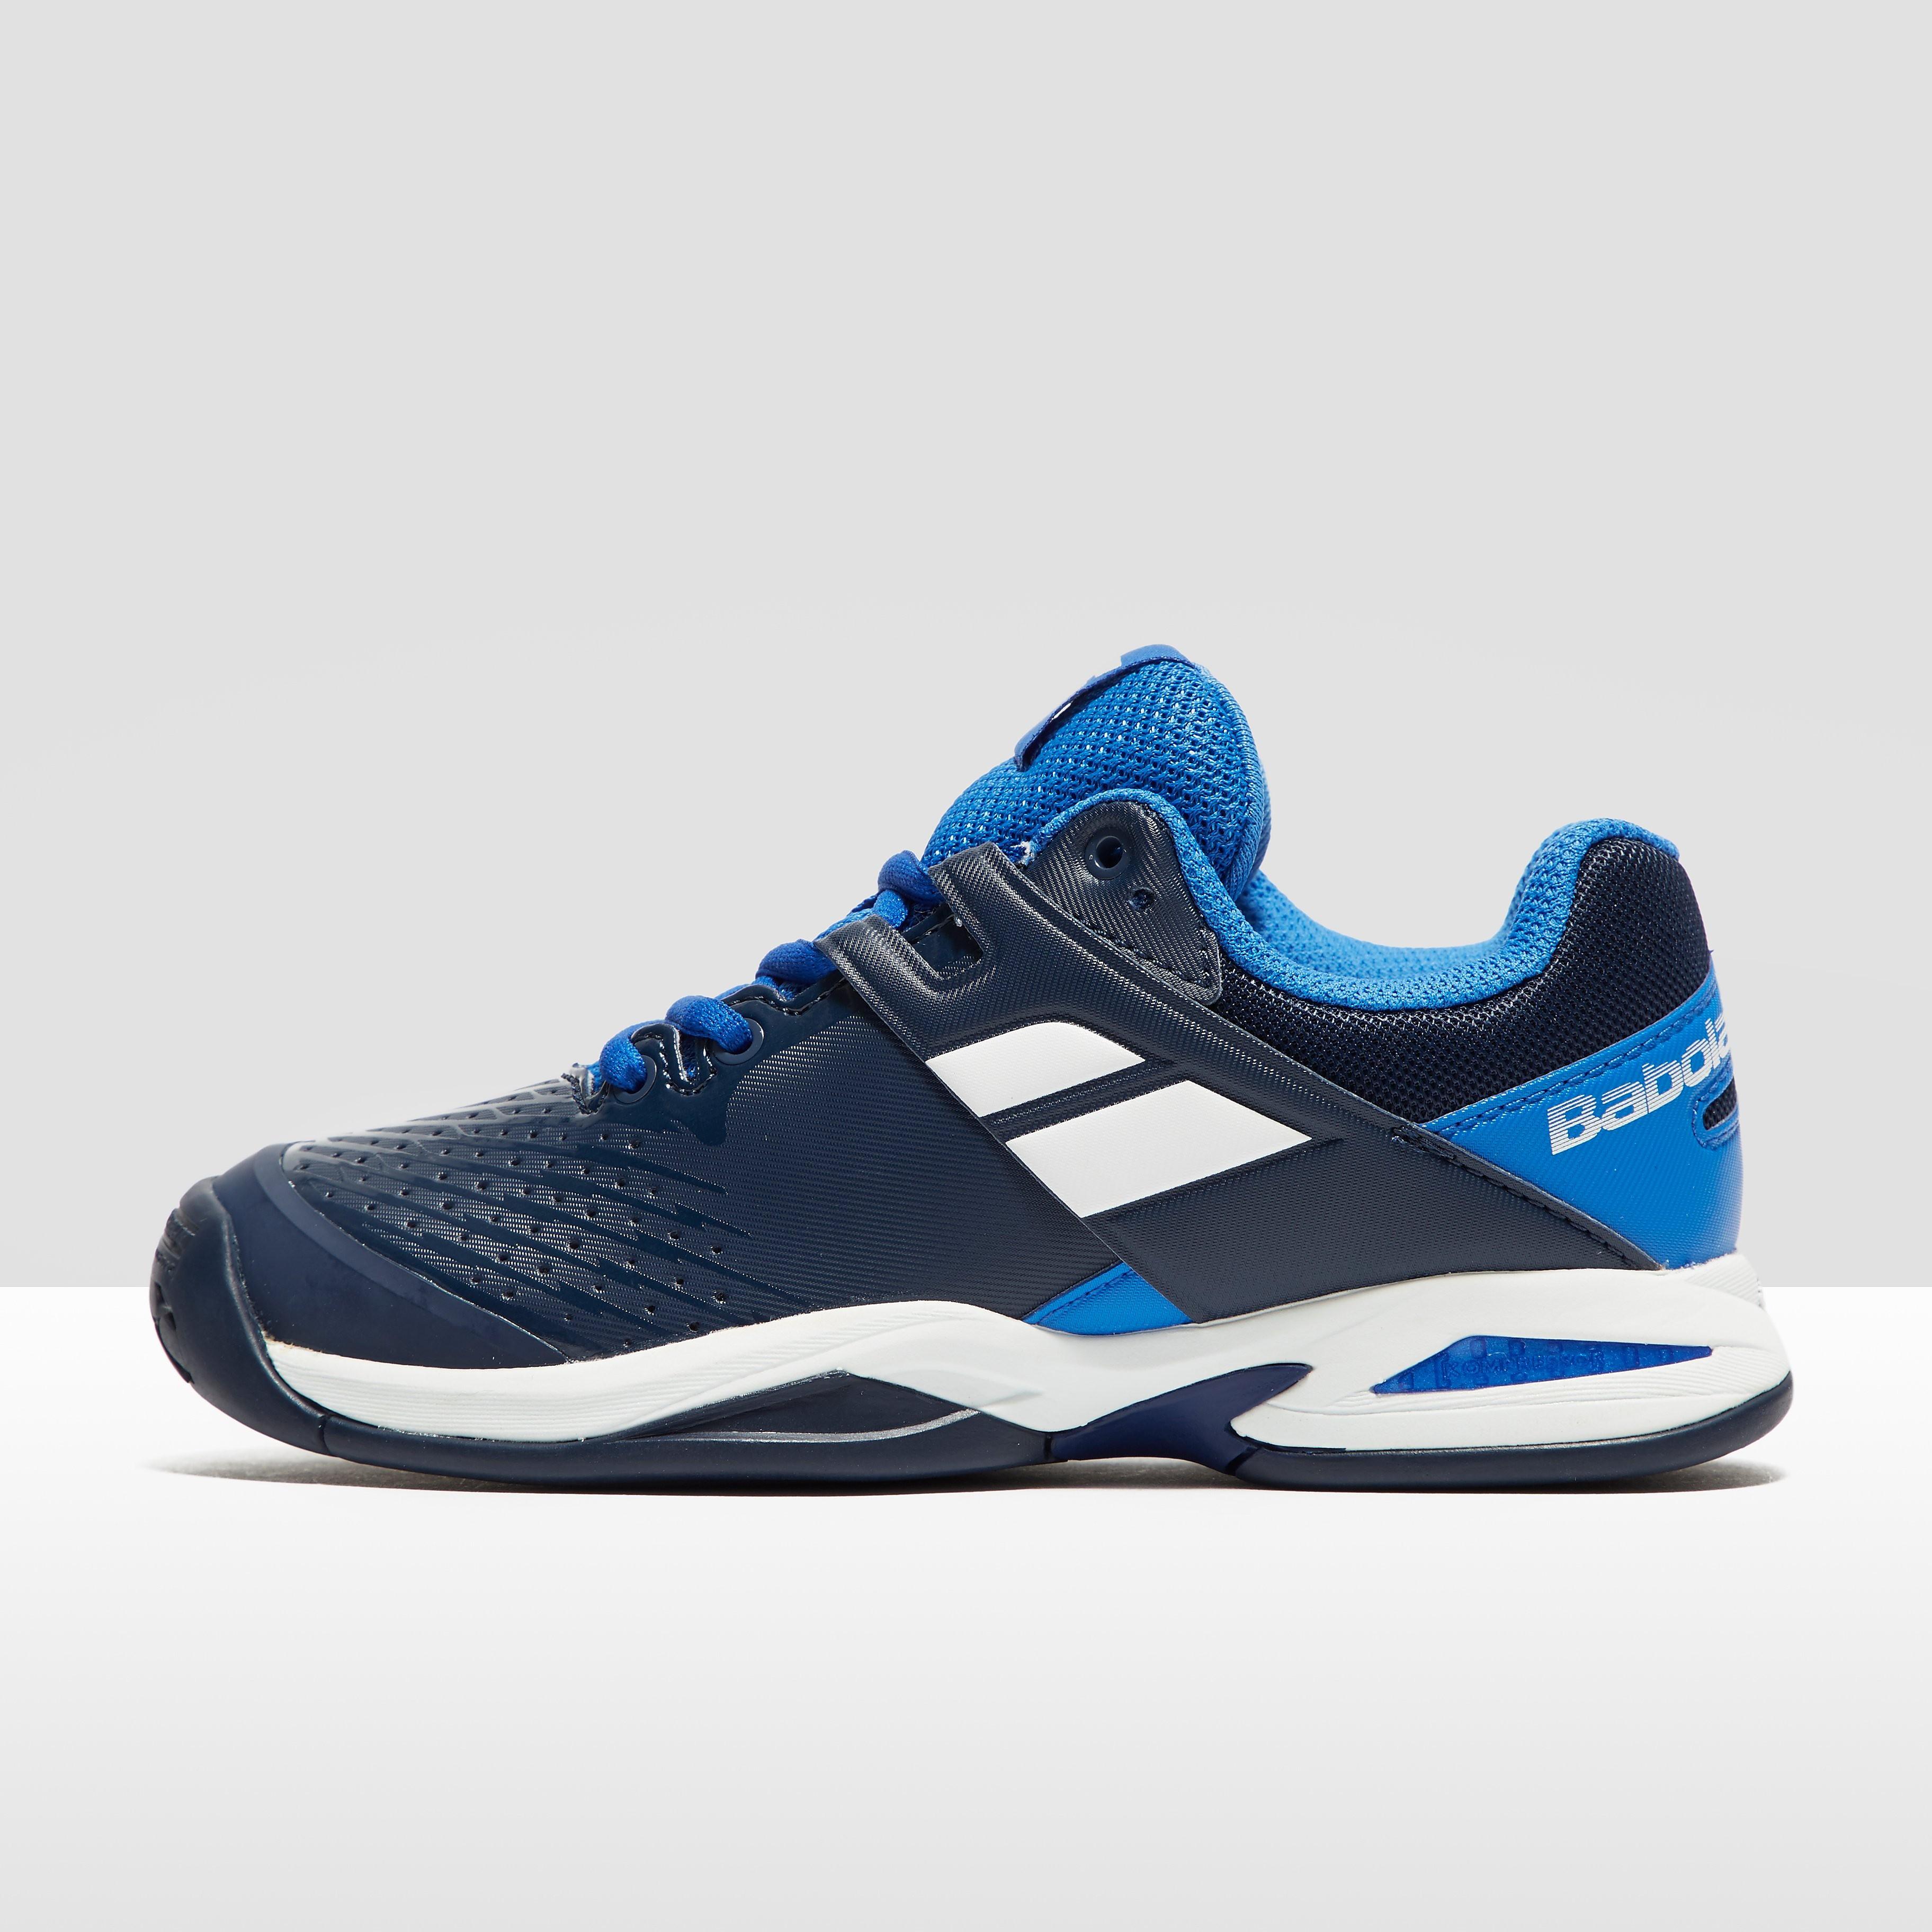 Babolat Propulse All Court Junior Tennis Shoes